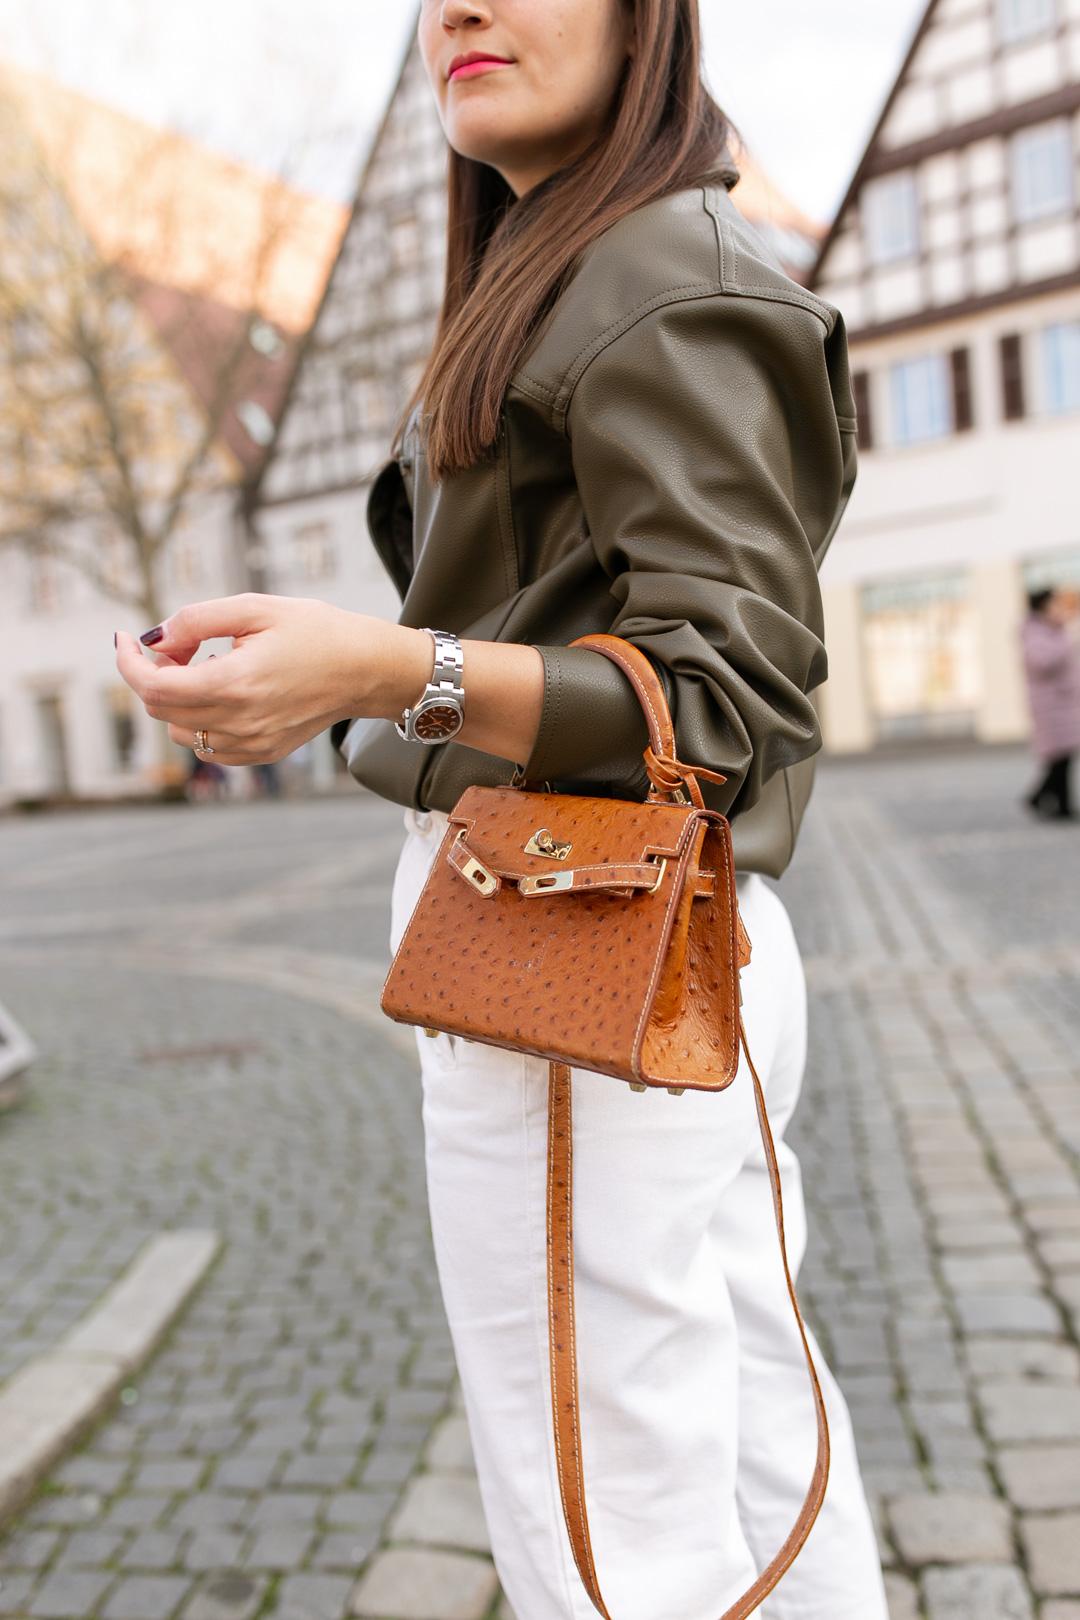 Fashion Trend Fake Leder - Pieces of Mariposa / Fashion & Lifestyle Blog aus Nürnberg